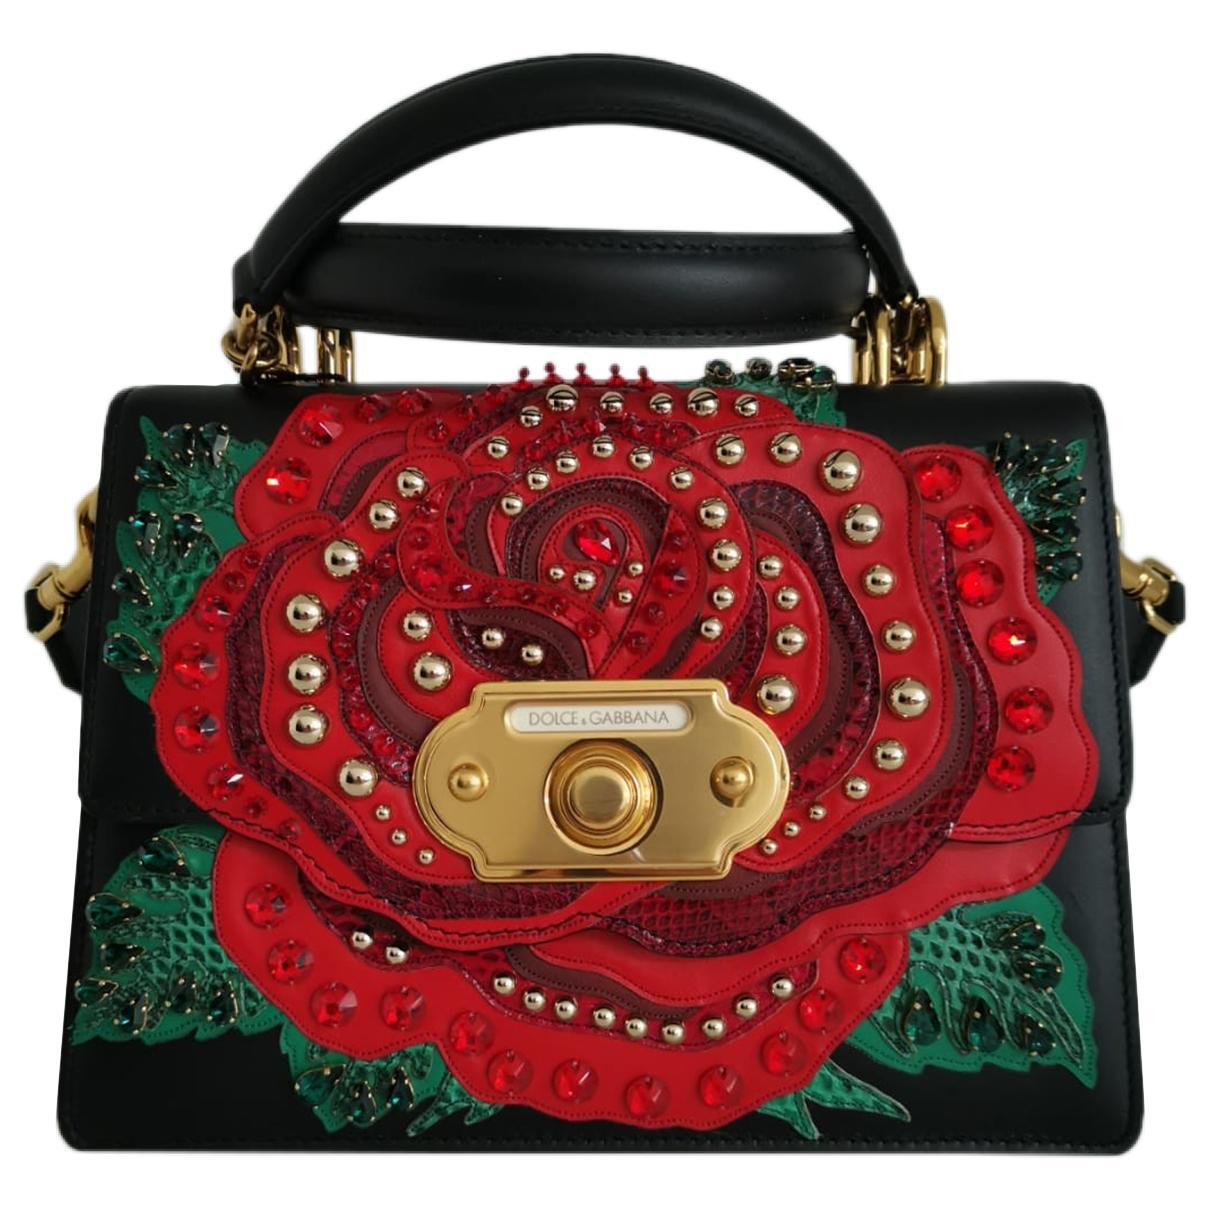 Dolce & Gabbana - Sac a main Welcome pour femme en cuir - multicolore